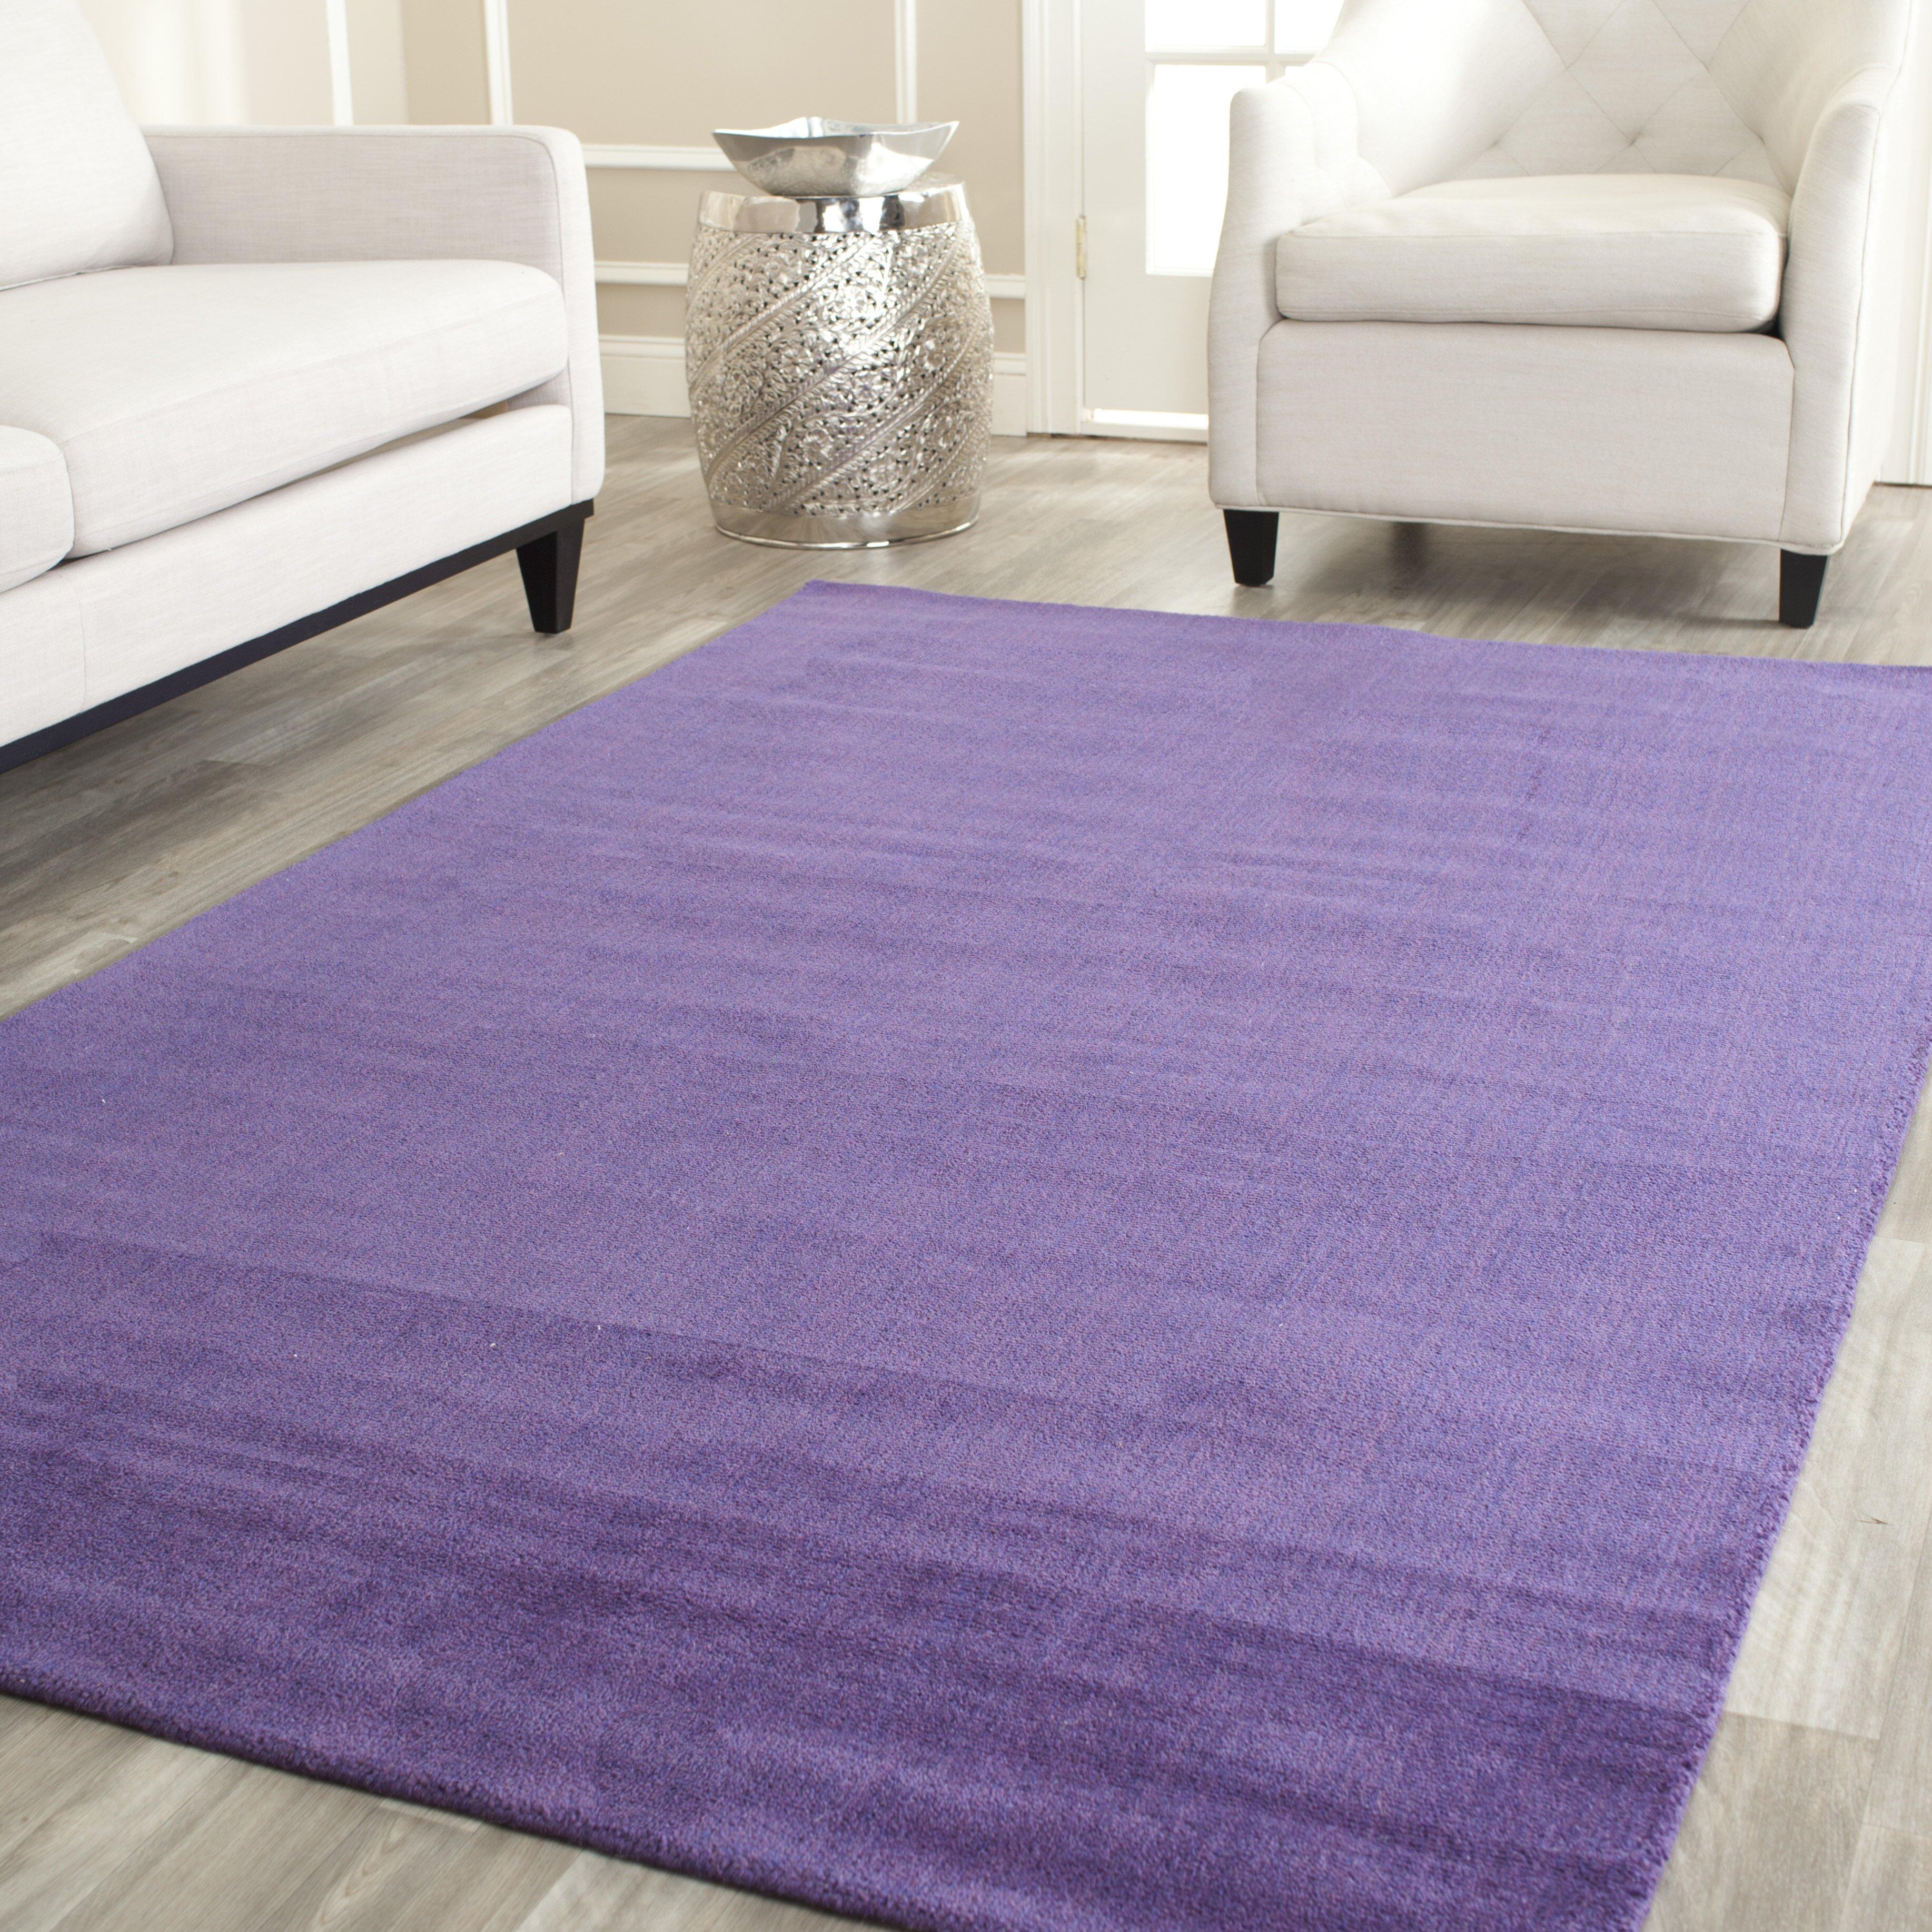 Purple And Lavender Rug: Safavieh Himalayan Purple Area Rug & Reviews